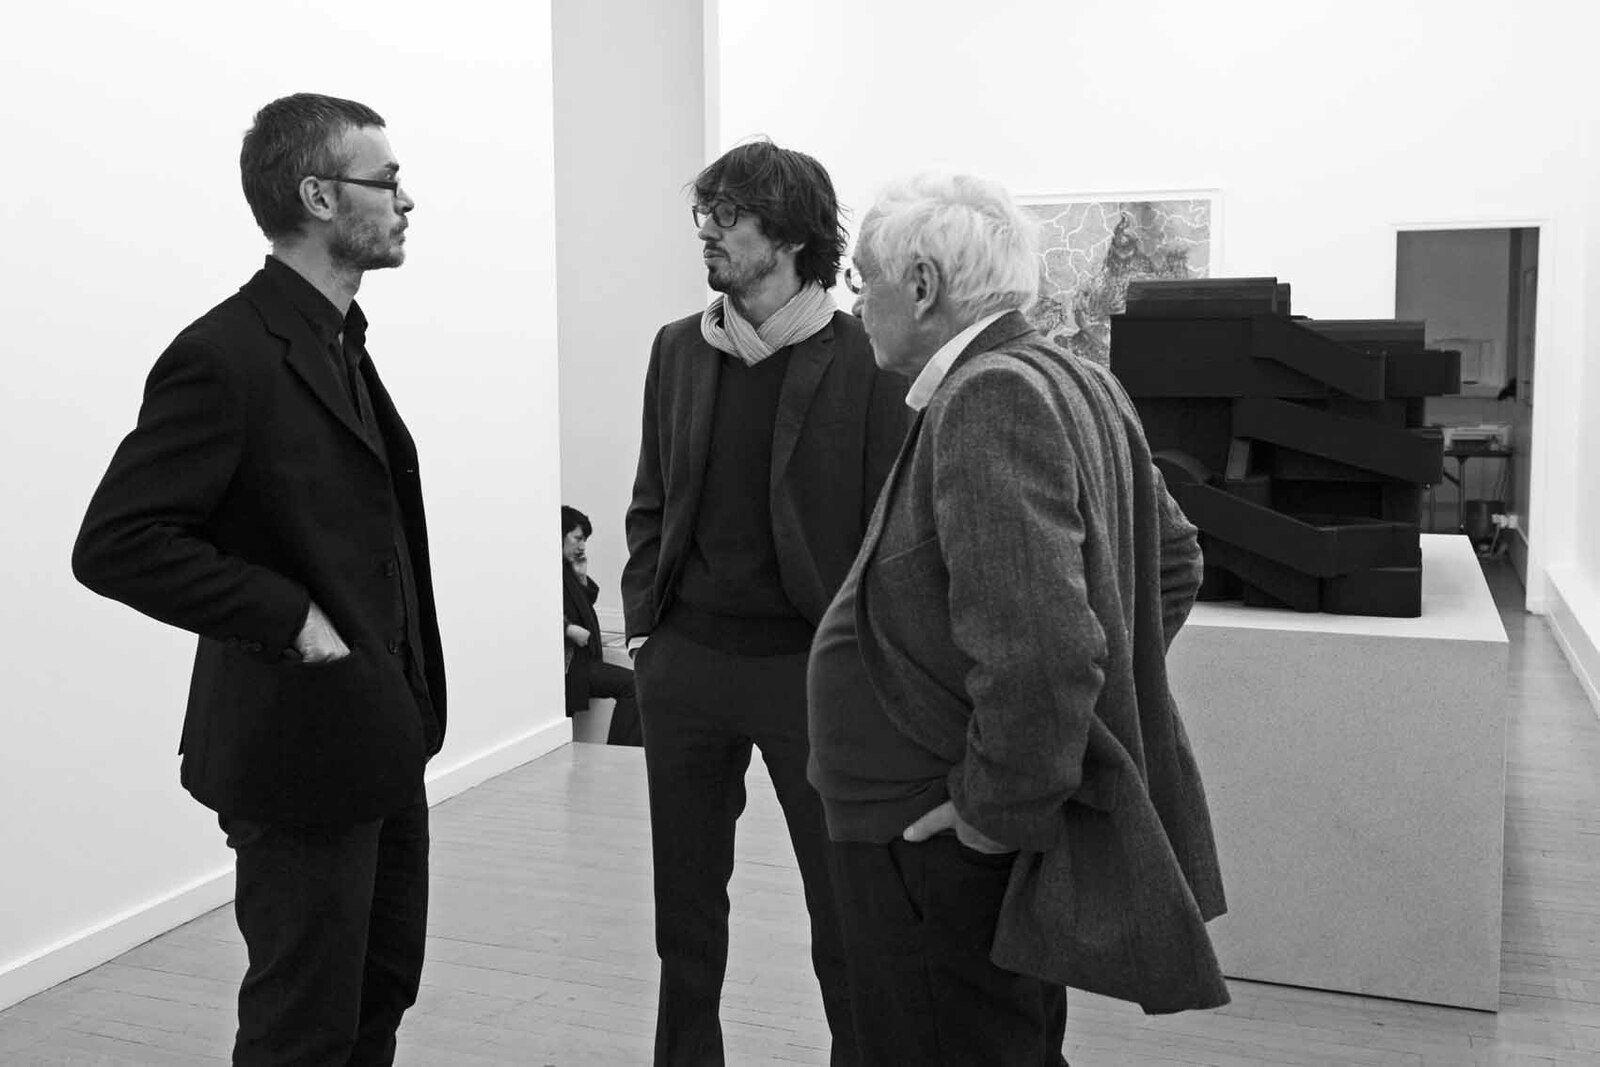 Rémy Jacquier, François Ceysson, Bernard Ceysson